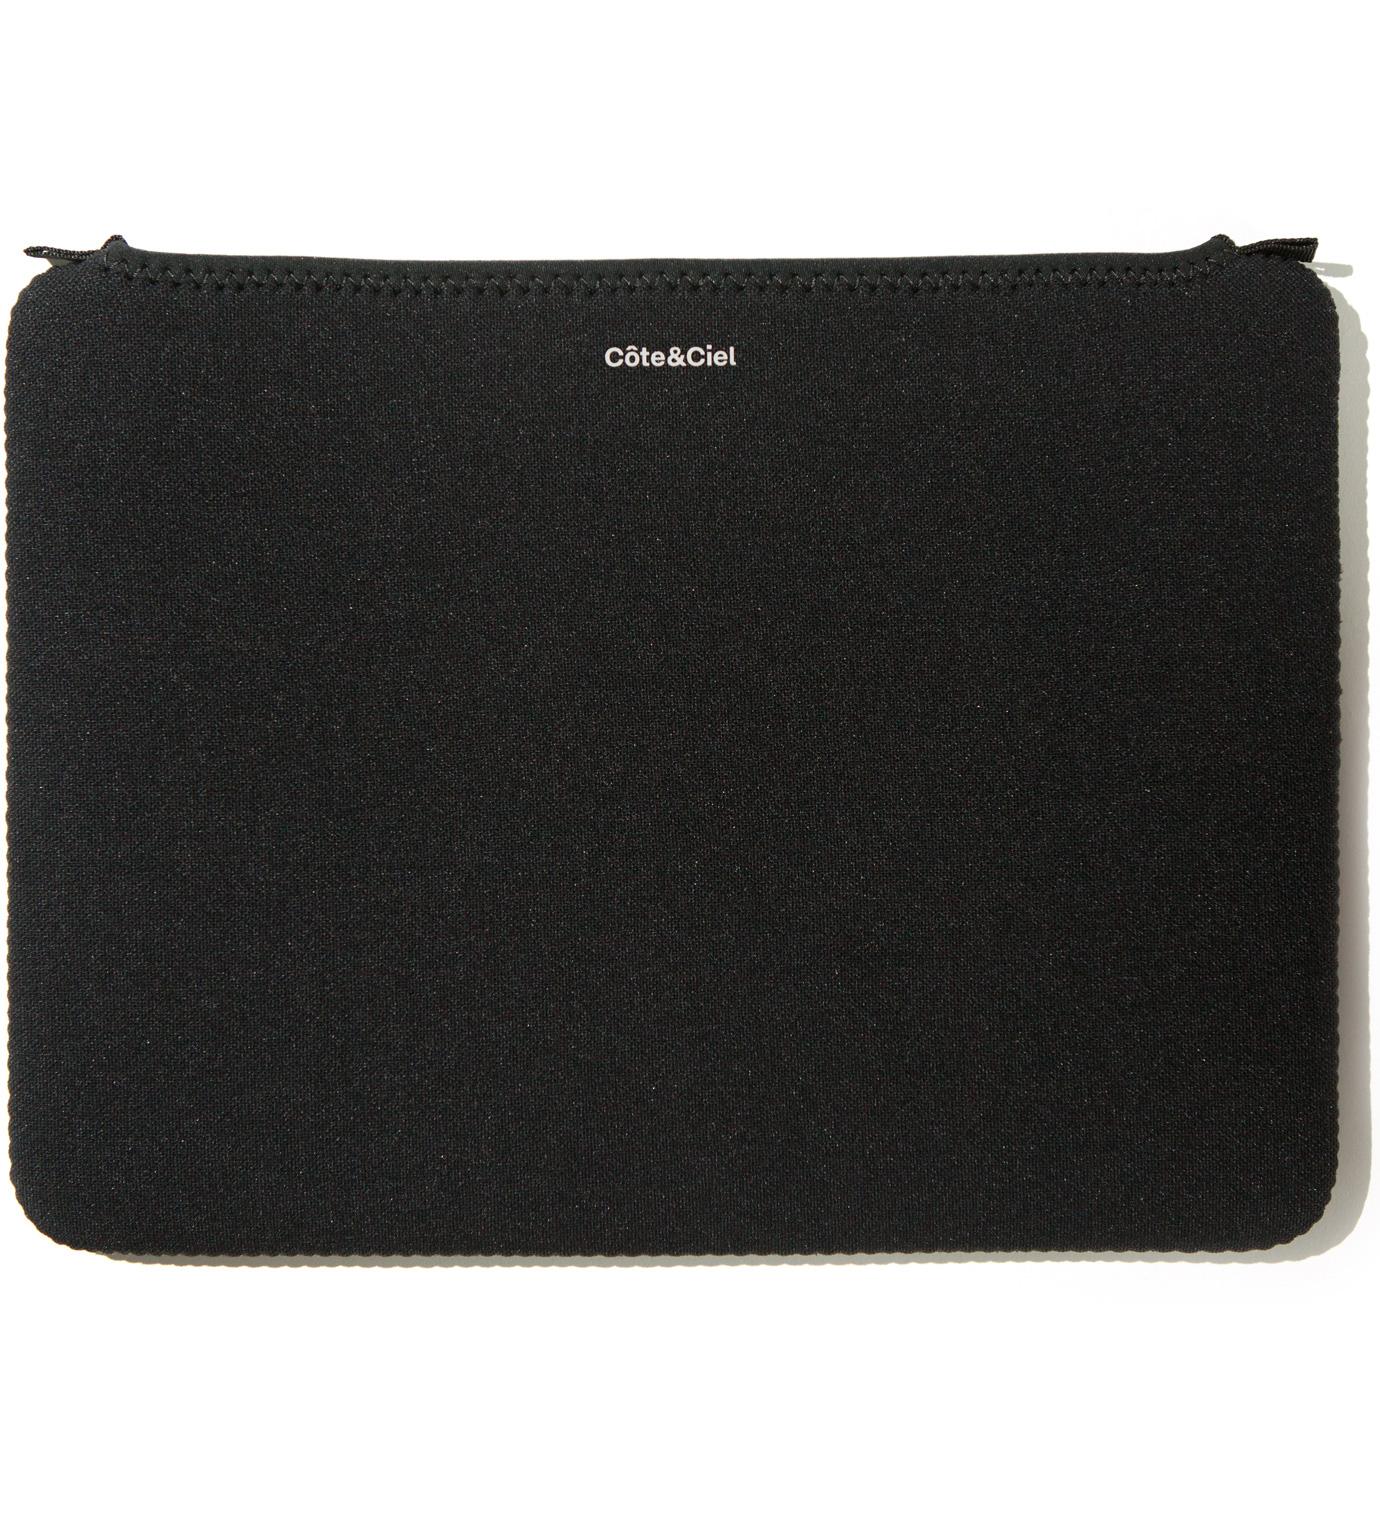 "Côte&Ciel Brazilian Slate MacBook Air 13"" Diver Sleeve"